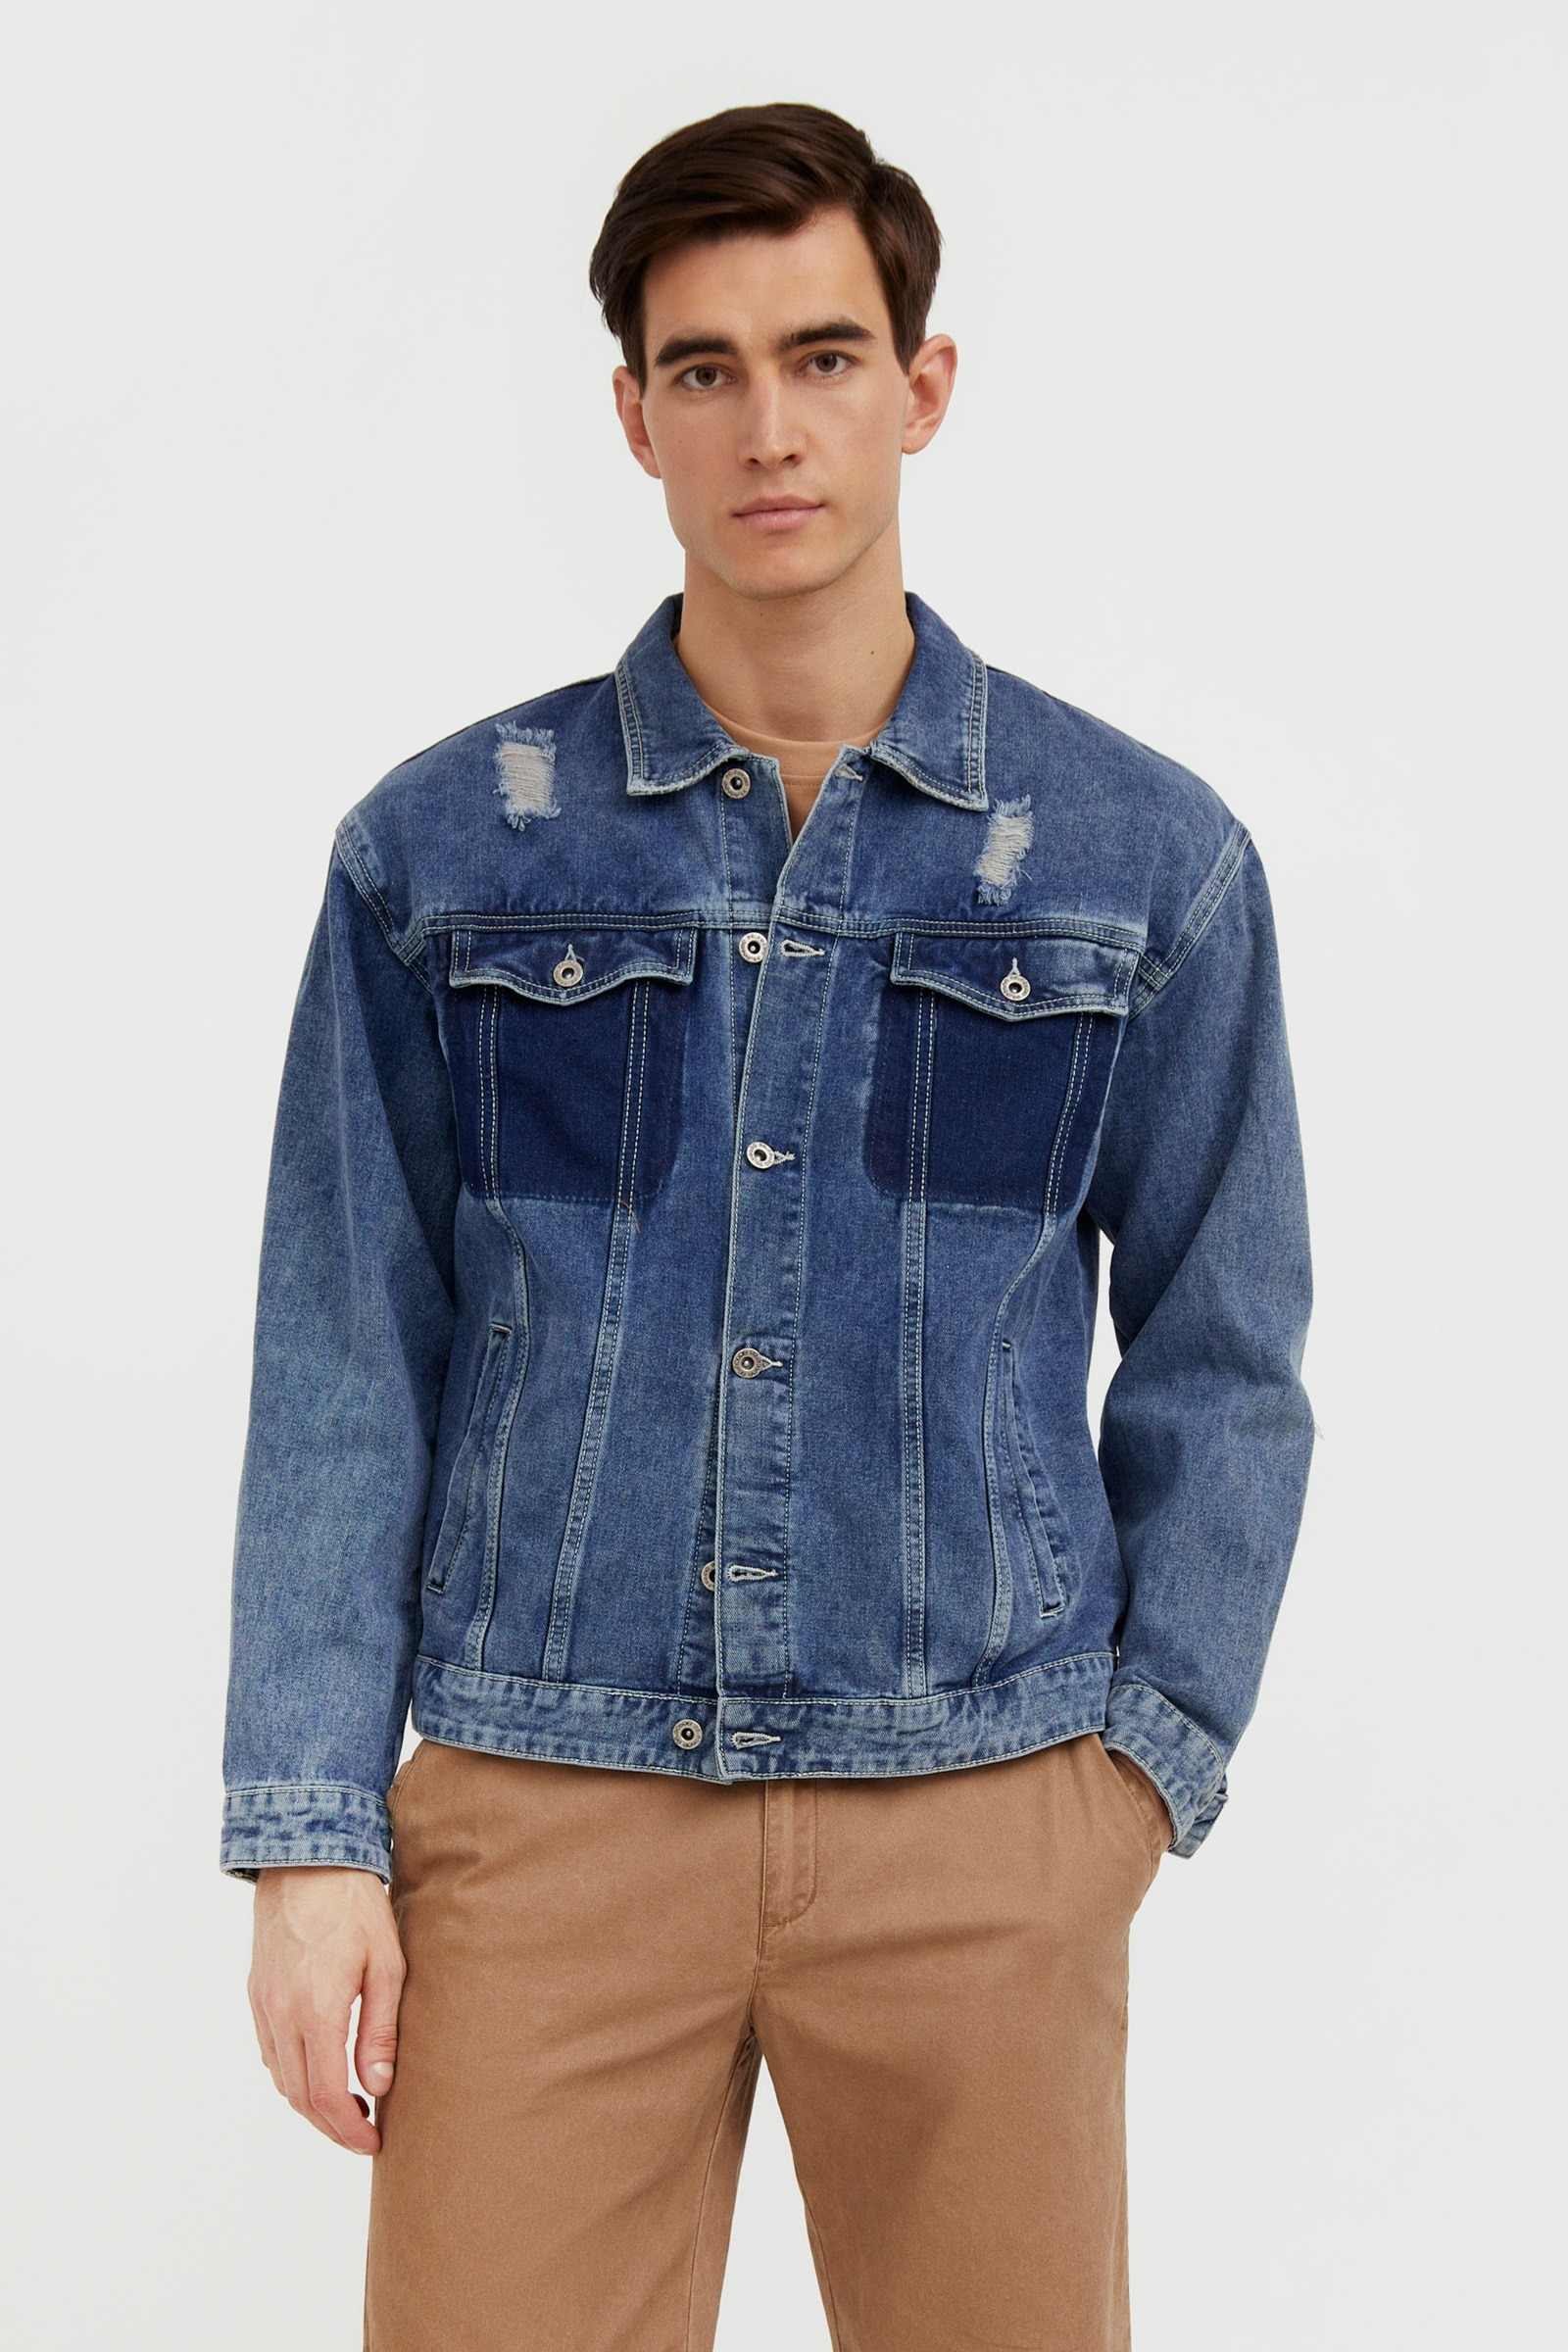 finn flare -  Jeansjacke, mit klassischem Kragen